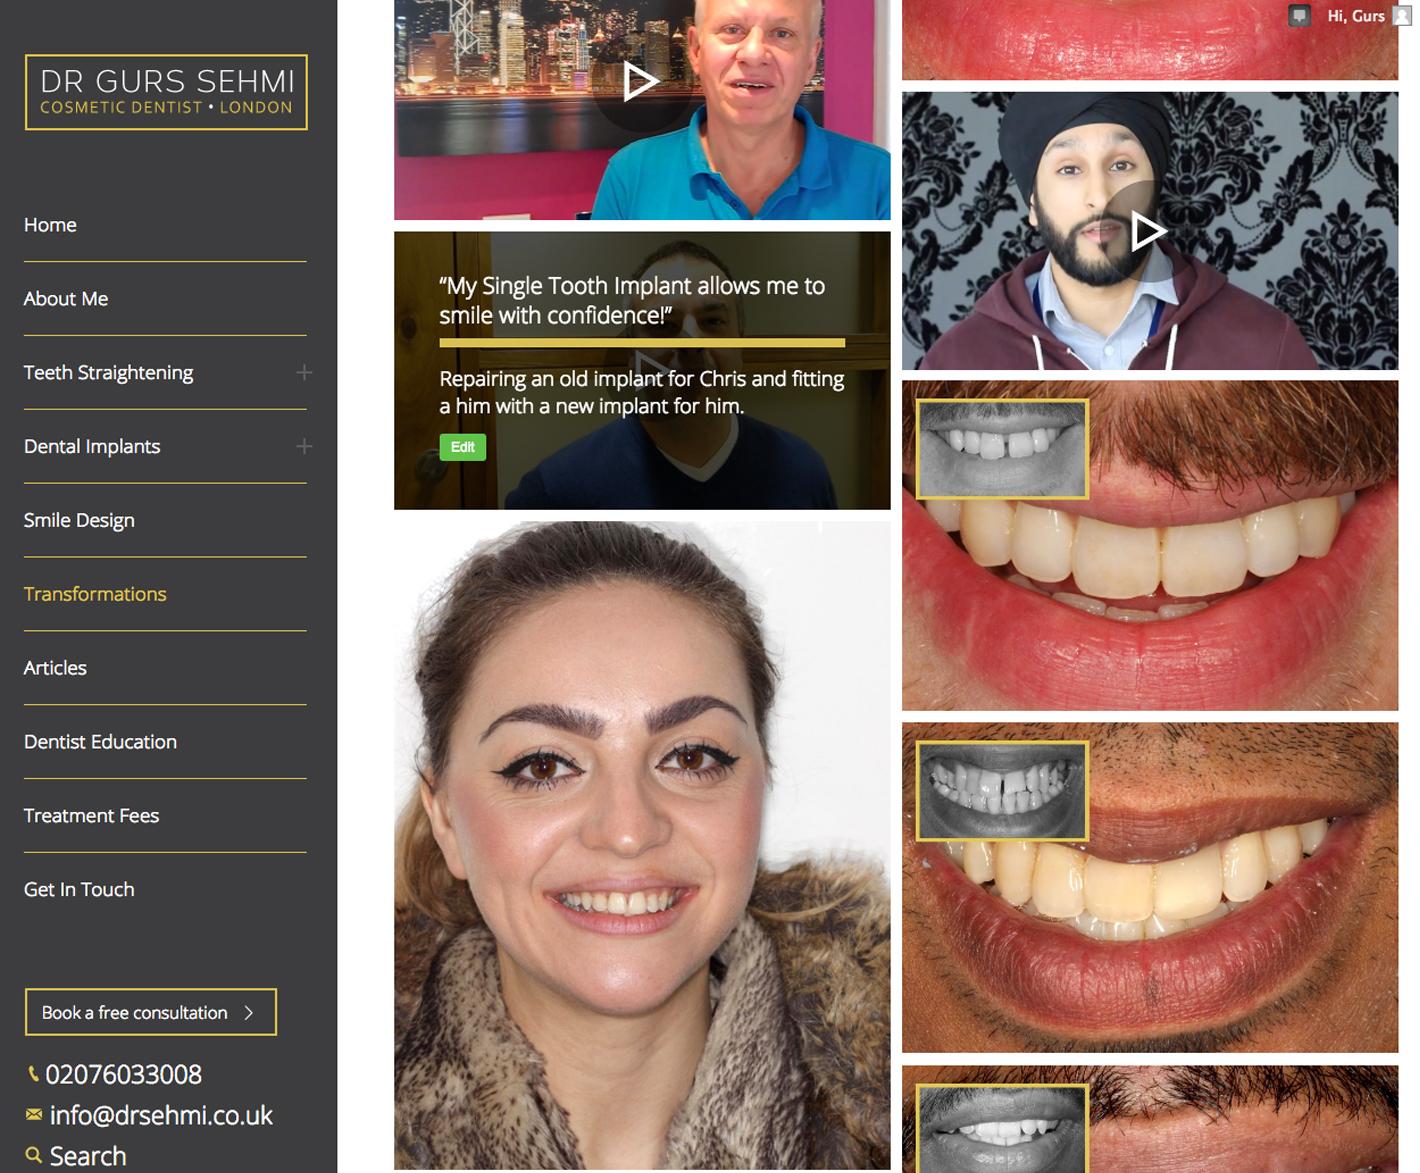 dentist website design oxford, Clear & Creative Oxford